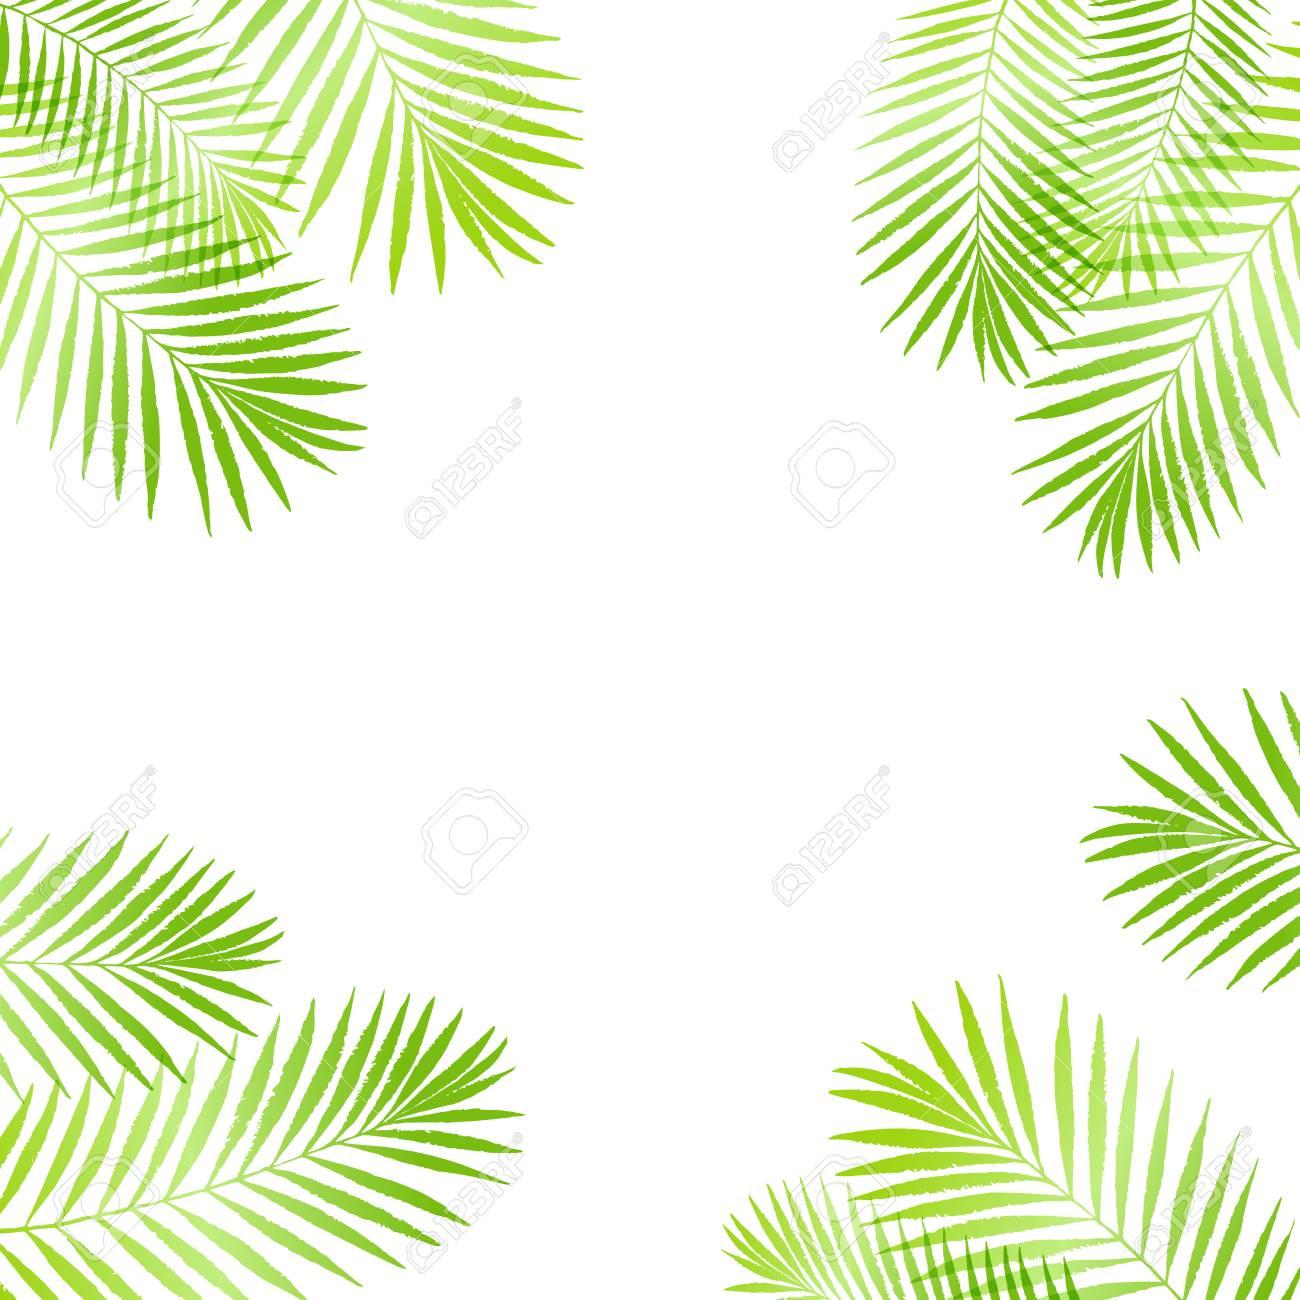 Summer Tropical Palm Tree Leaves Border Frame Background Vector Grunge Design For Card